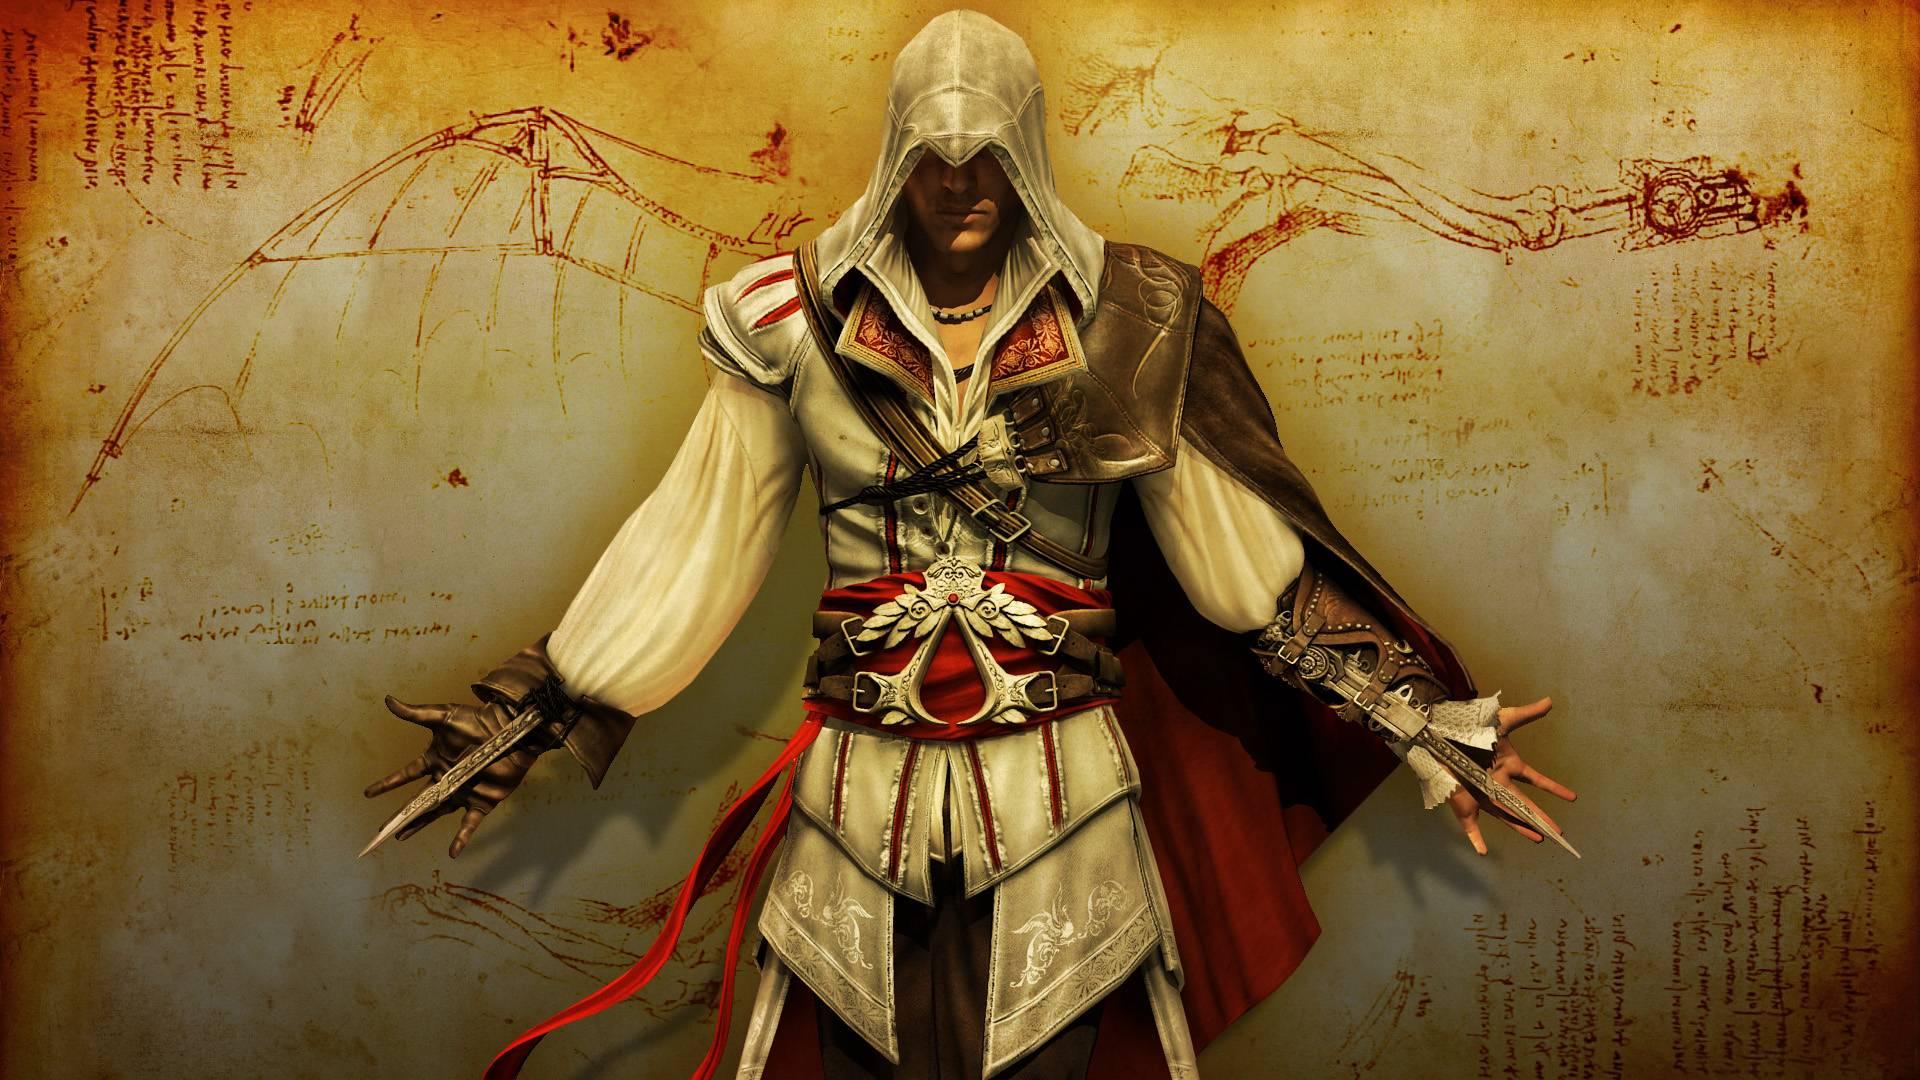 Add Media Report Rss Assassins Creed Ii Ezio Wallpaper View Original